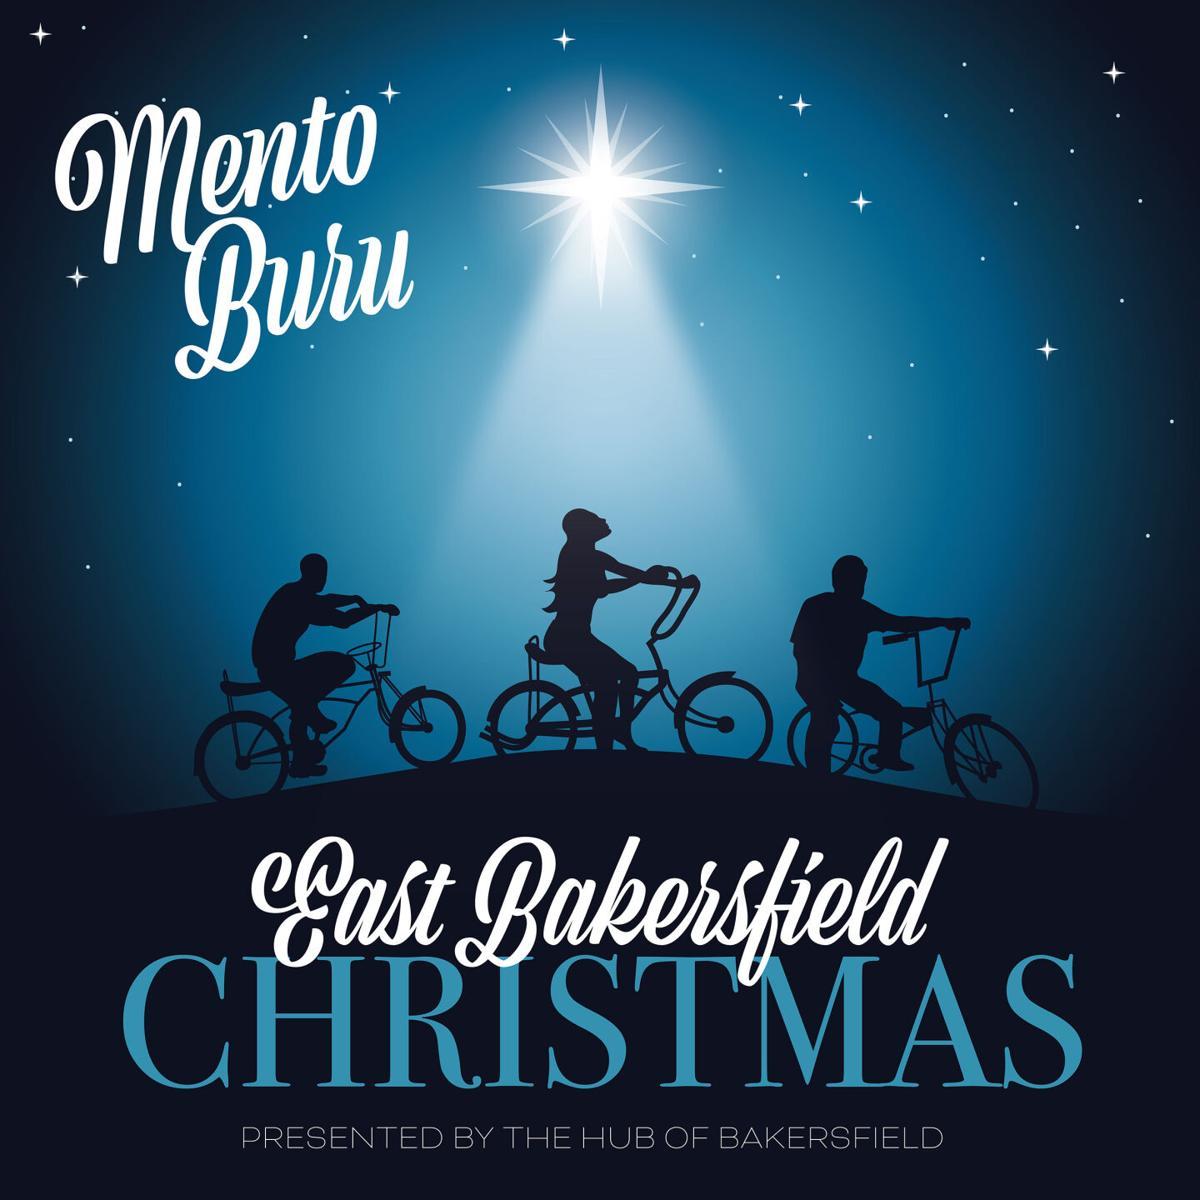 east bakersfield christmas